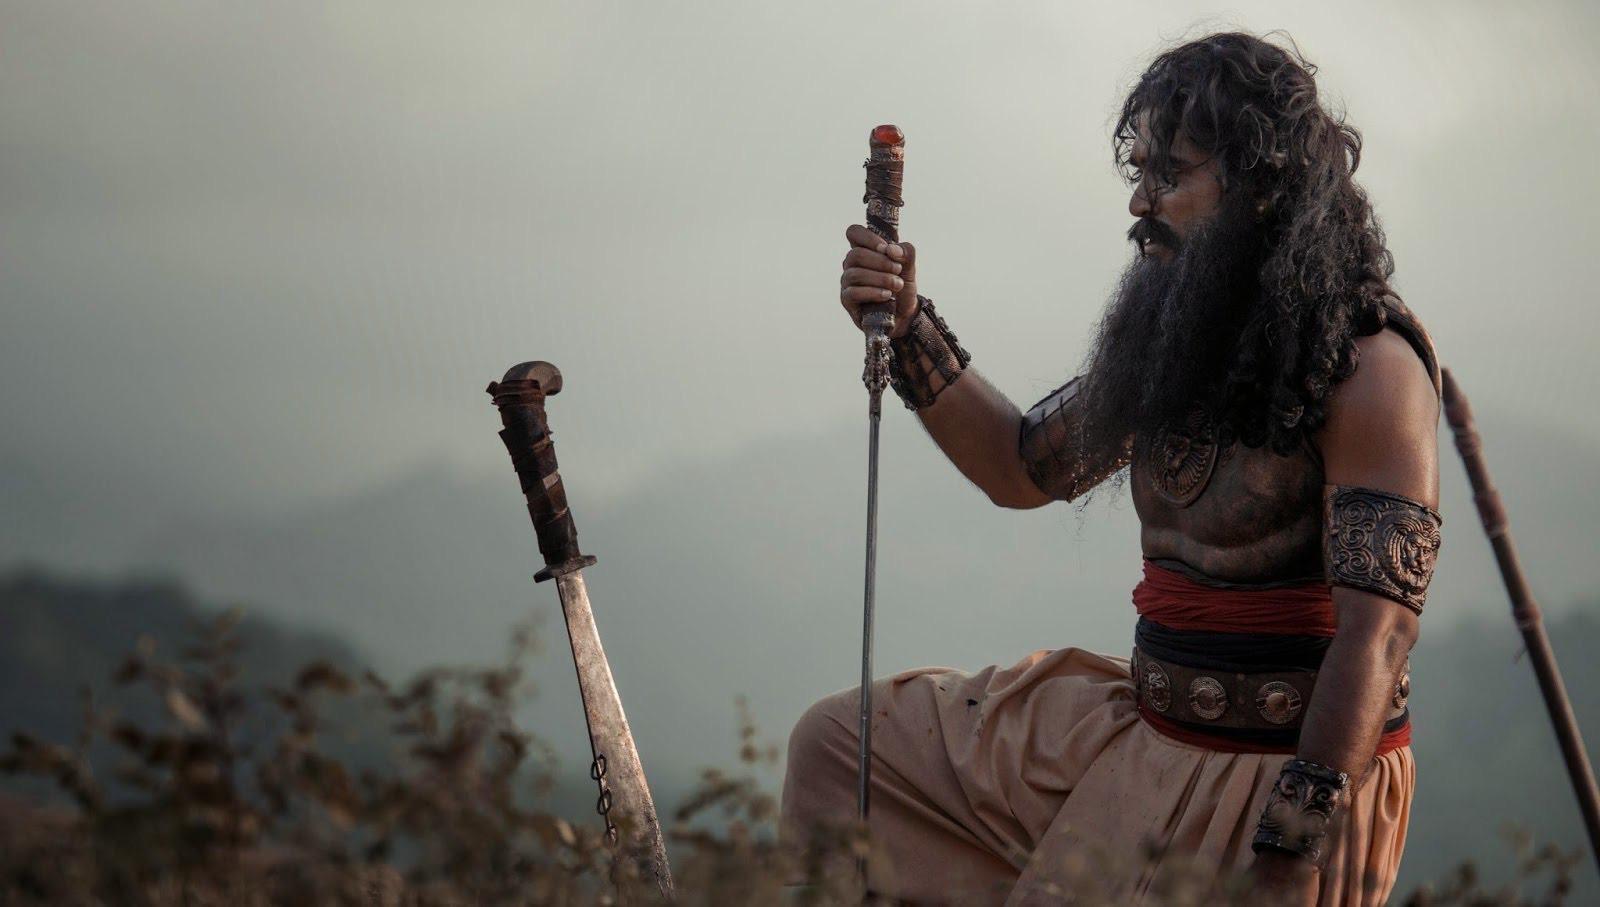 Aloko Udapadi by Chathra Weeraman